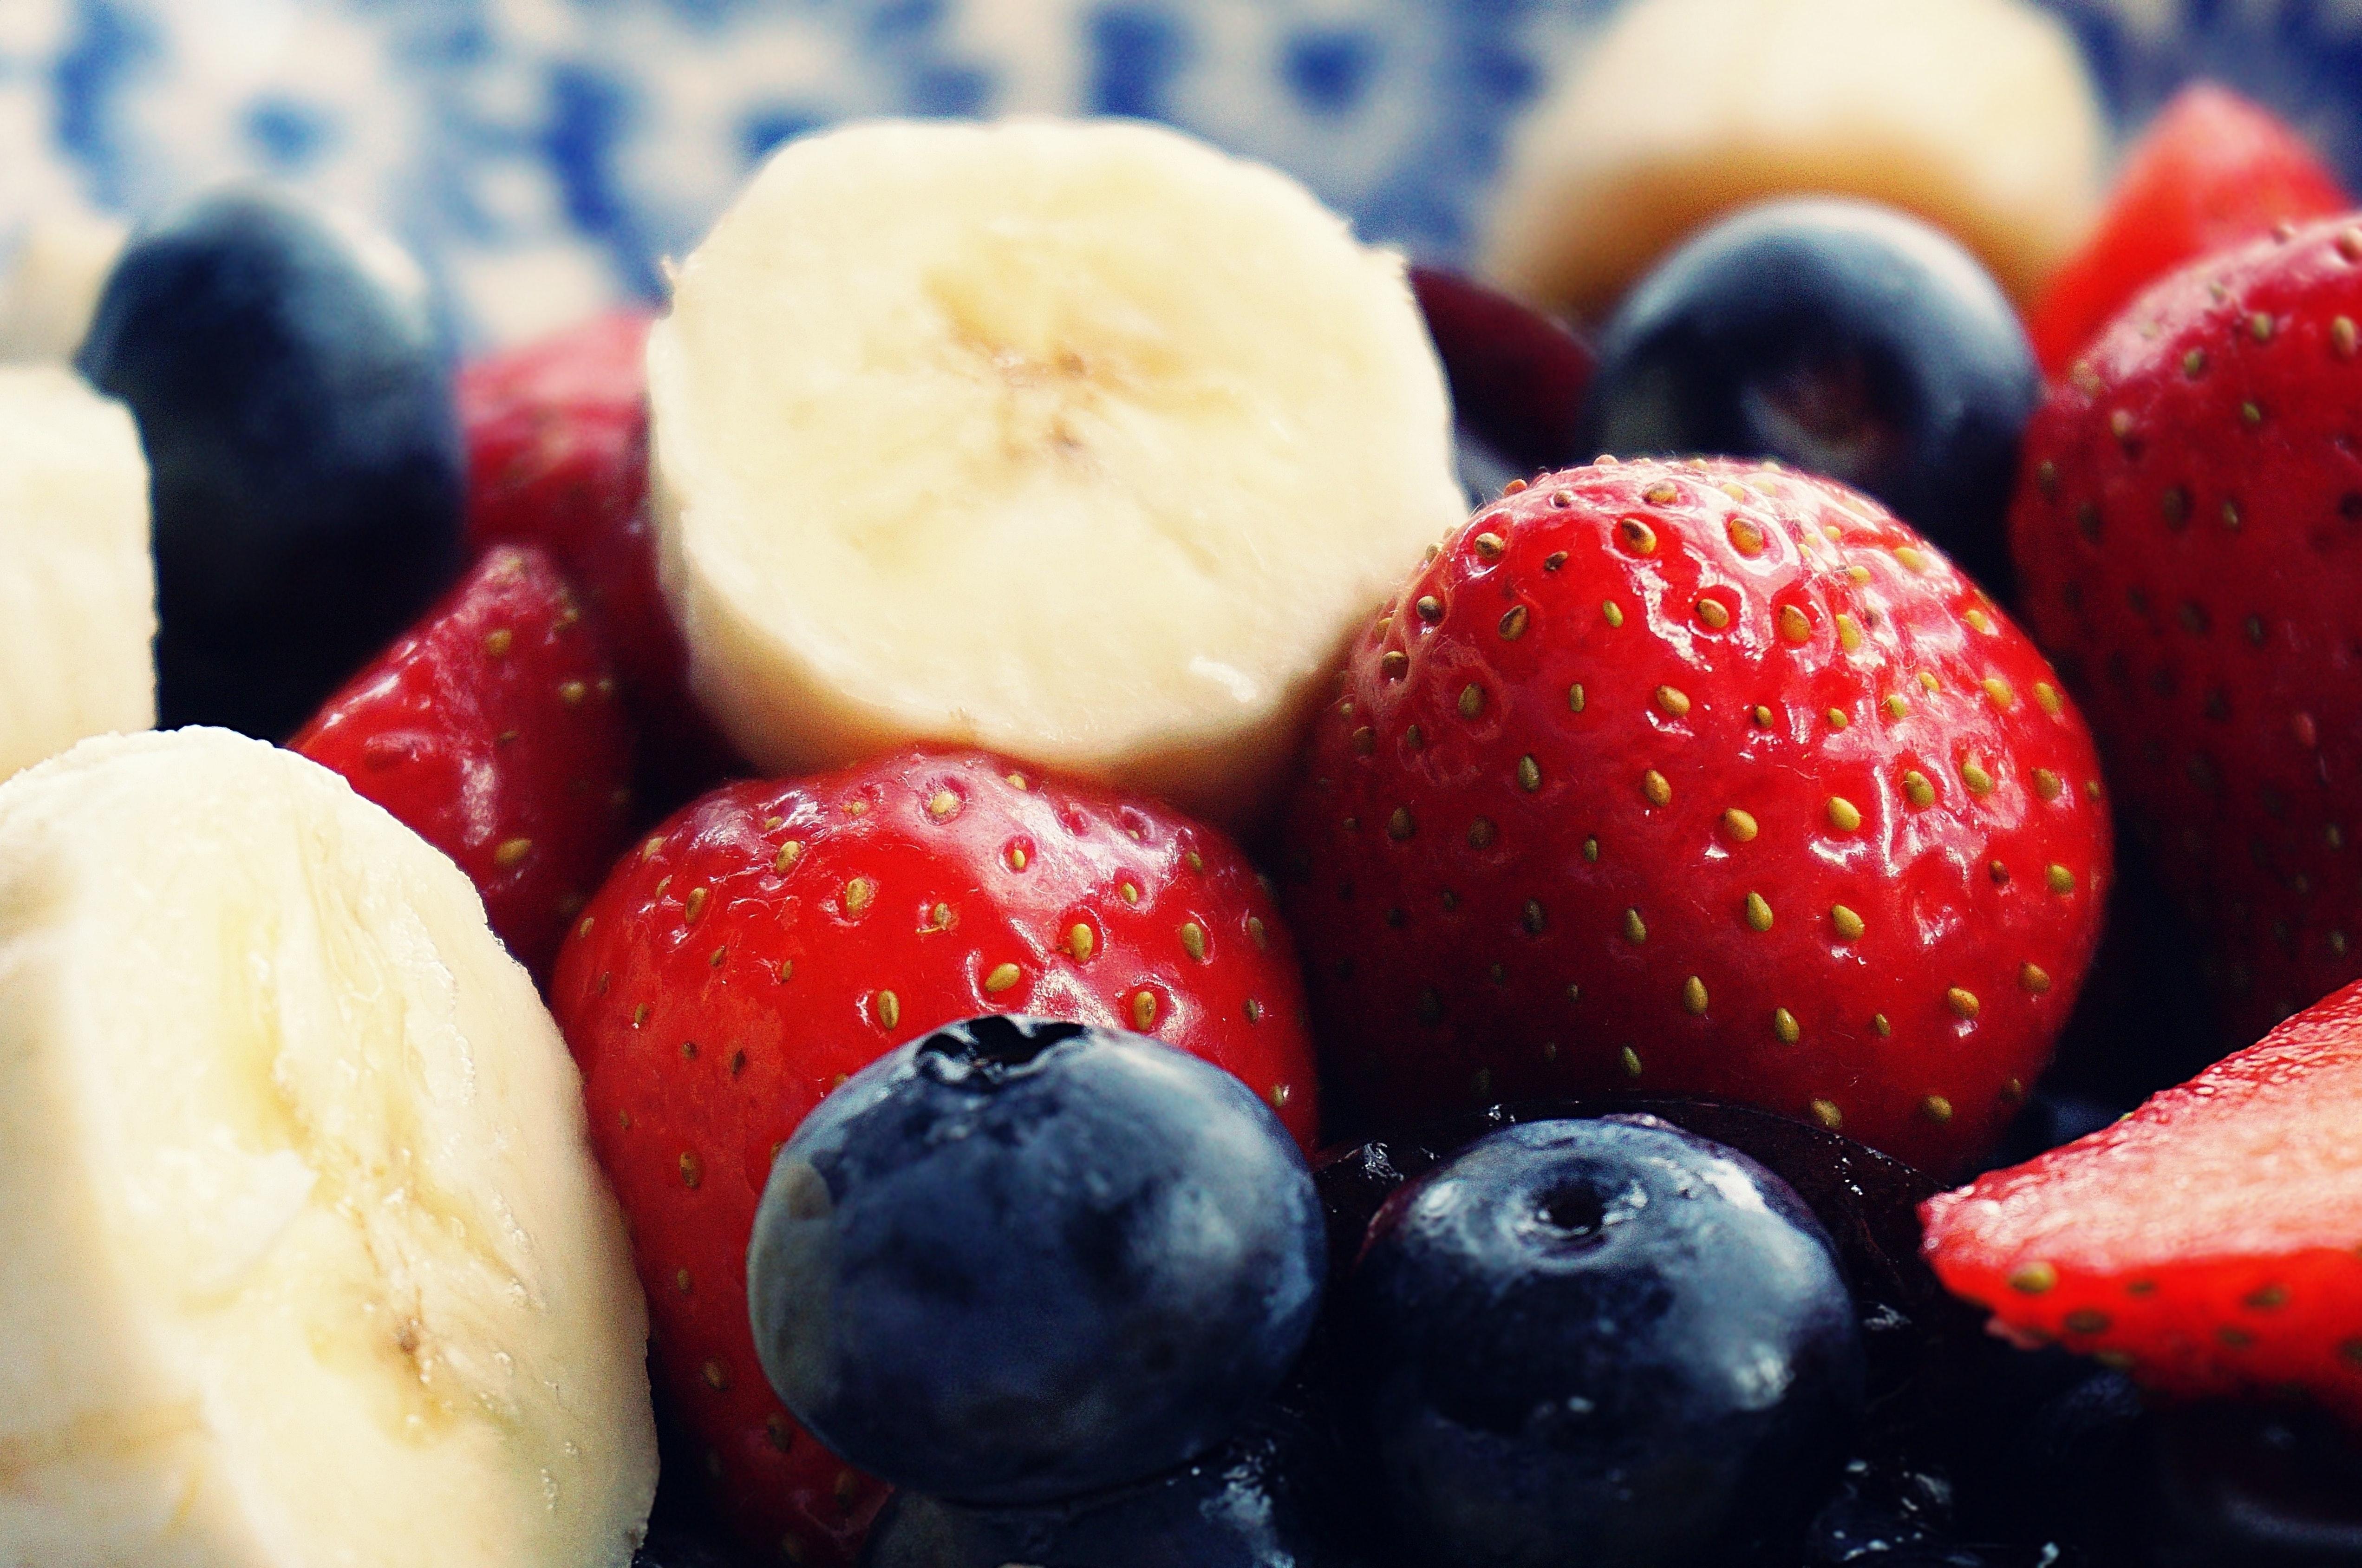 antioxidant-banana-berries-1120581